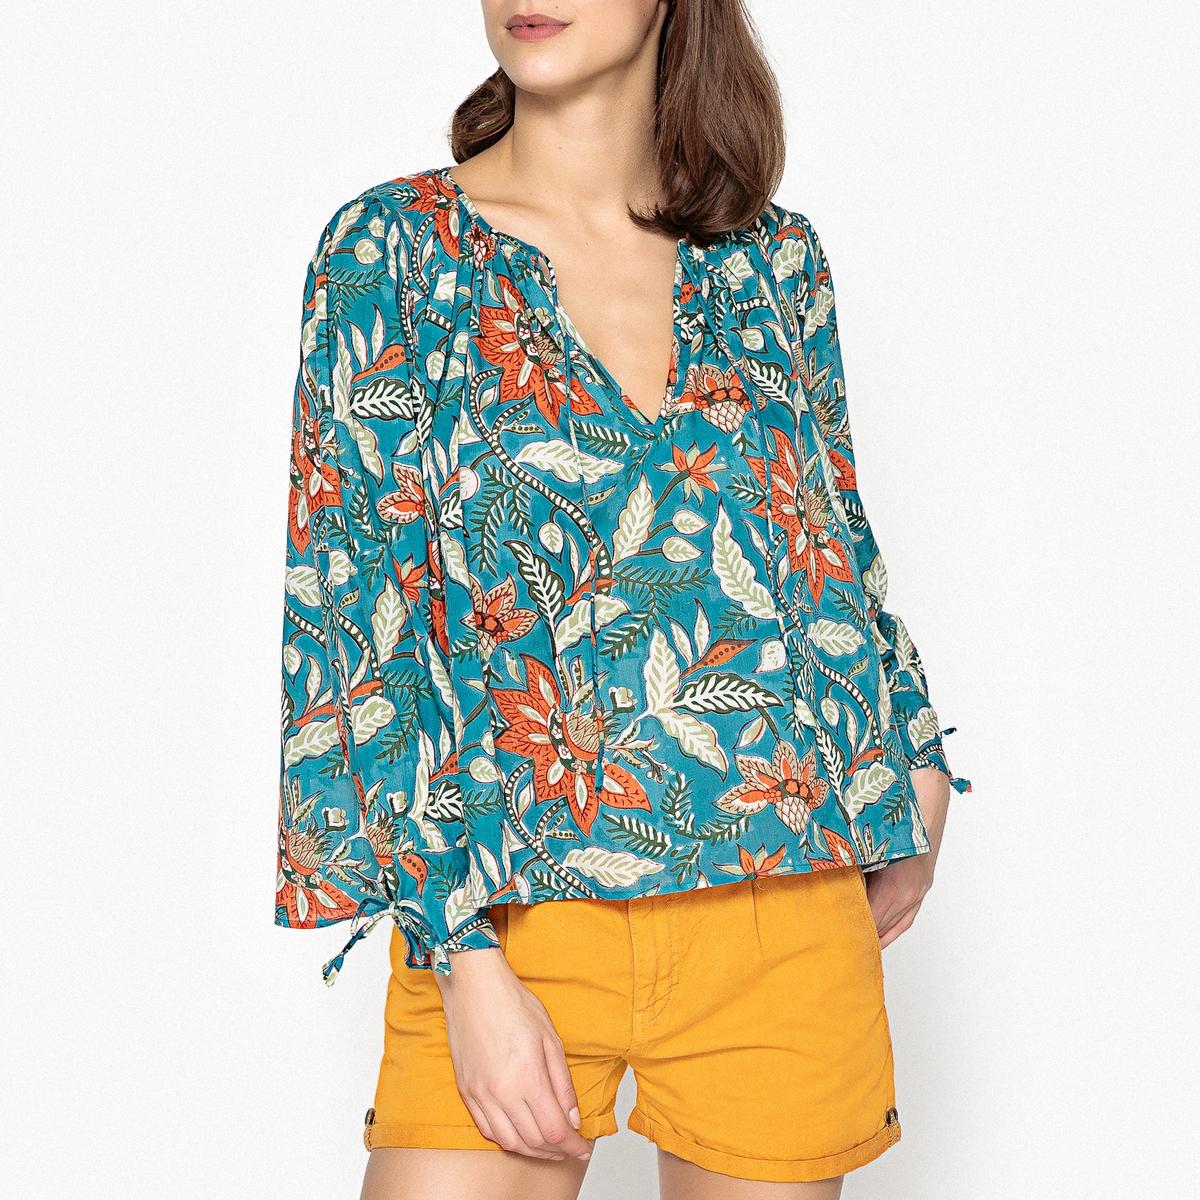 Блузка с рисунком и рукавами с напуском KALAO BLOUSE ruffle trim blouse